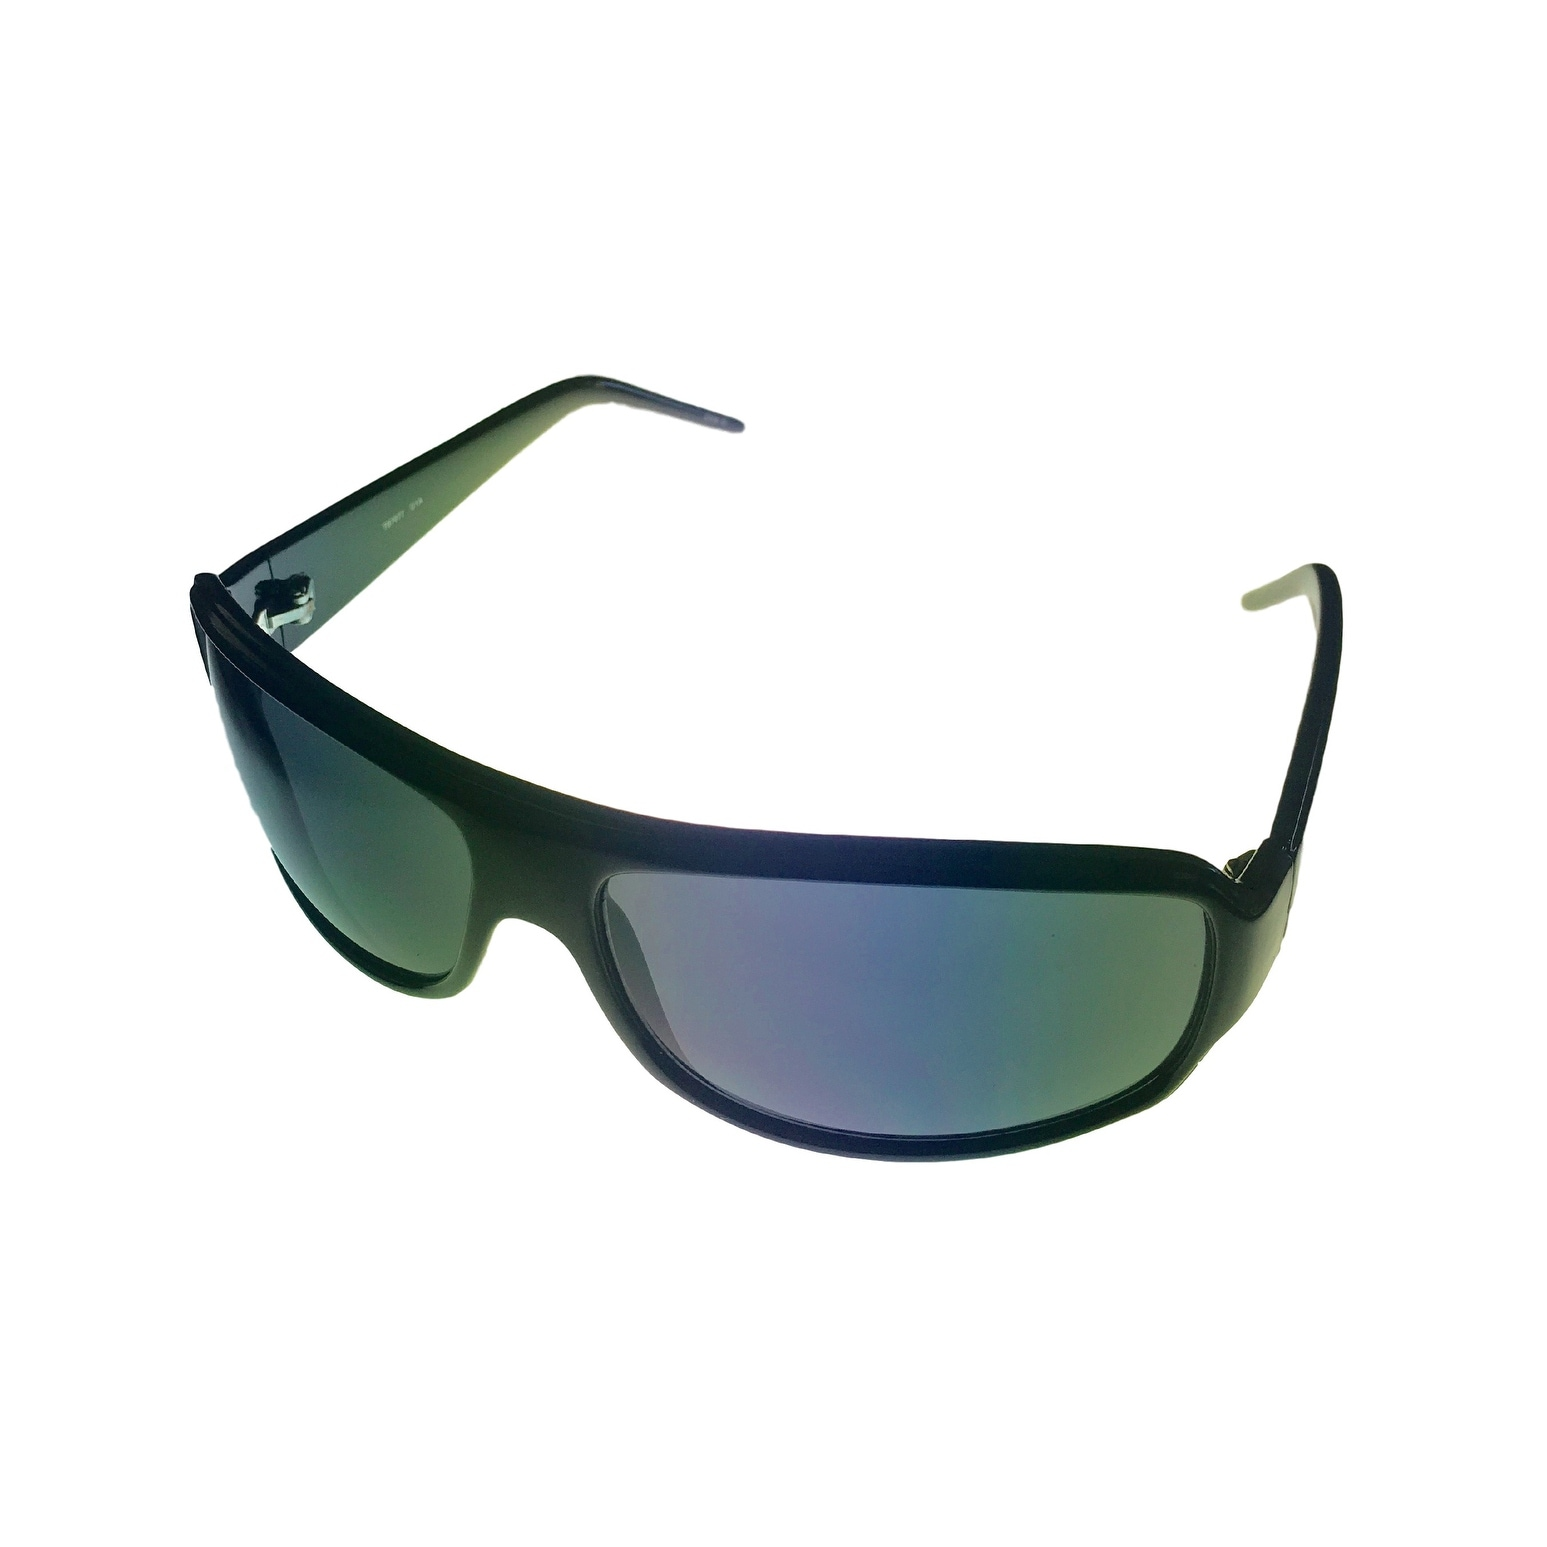 Timberland Sunglass Mens Black, Solid Smoke Lens Plastic Wrap TB7077 1A - Thumbnail 0